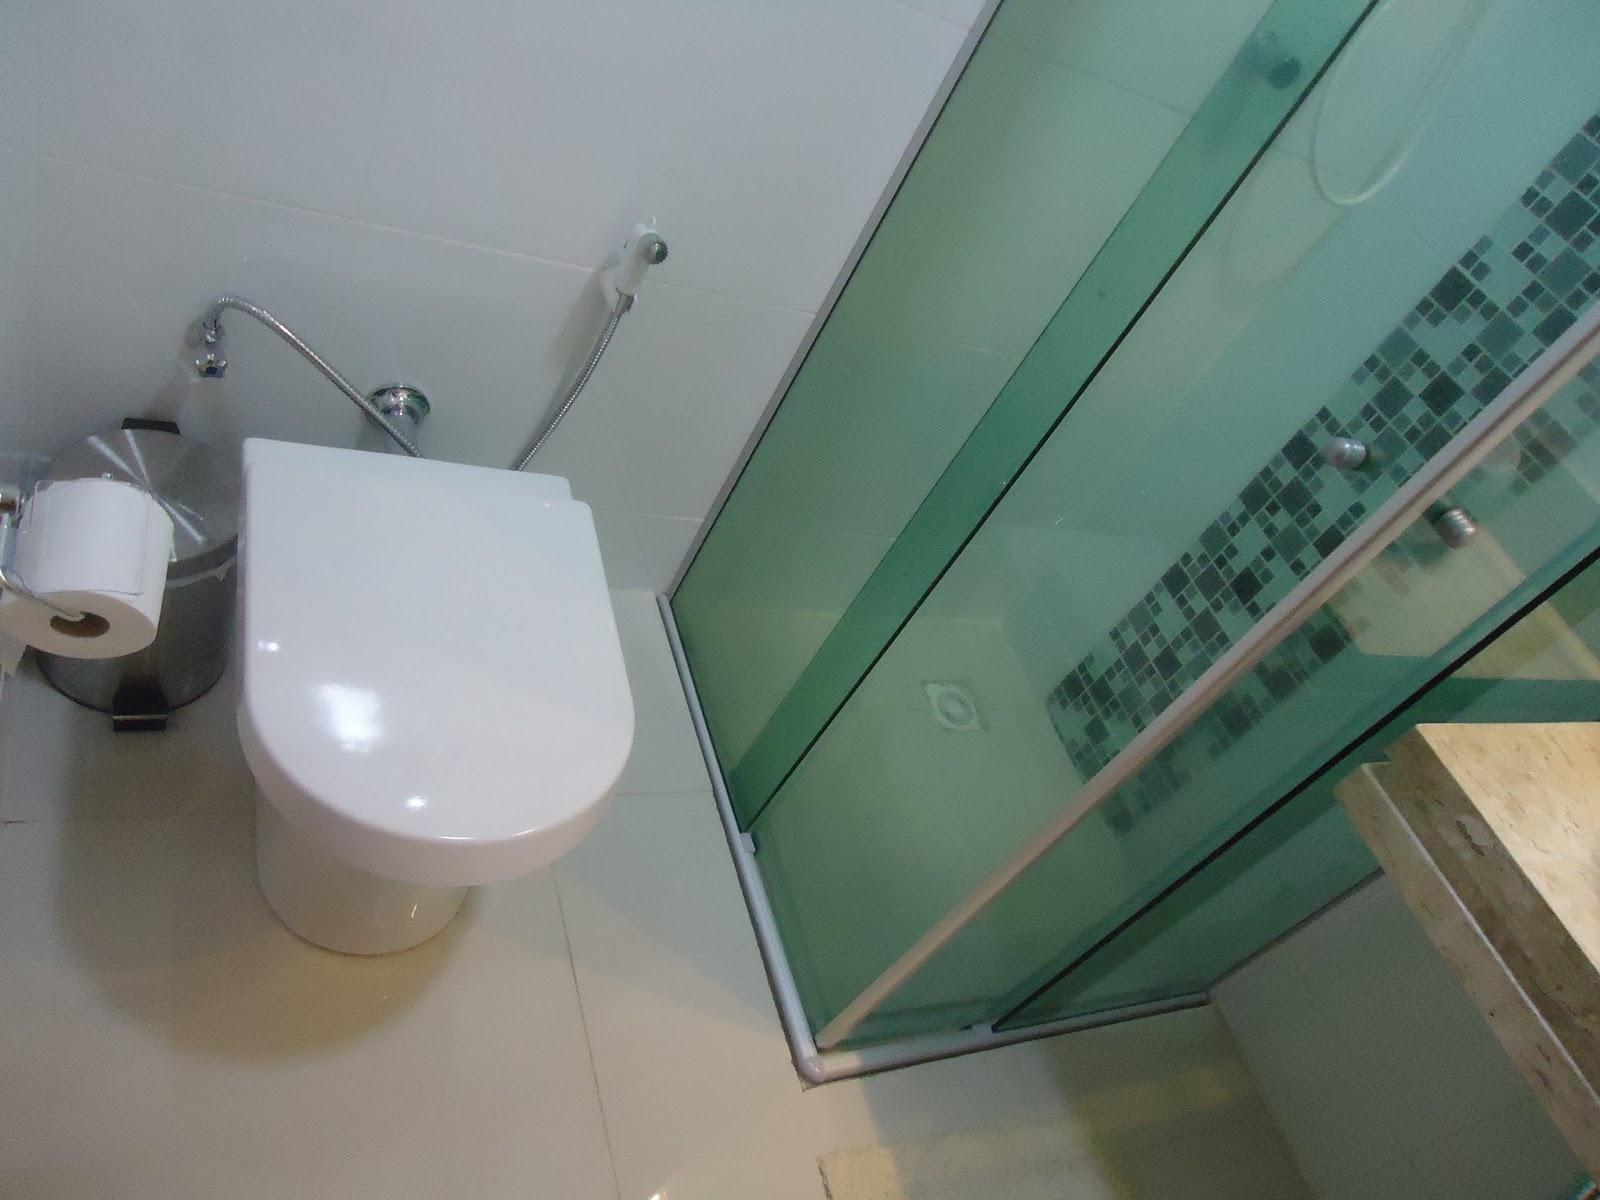 Vaso sanitário Roca Nexo/ Tábua amortecedora Roca Nexo/Porcelanato  #886E43 1600x1200 Banheiro Com Pastilha Atras Do Vaso Sanitario